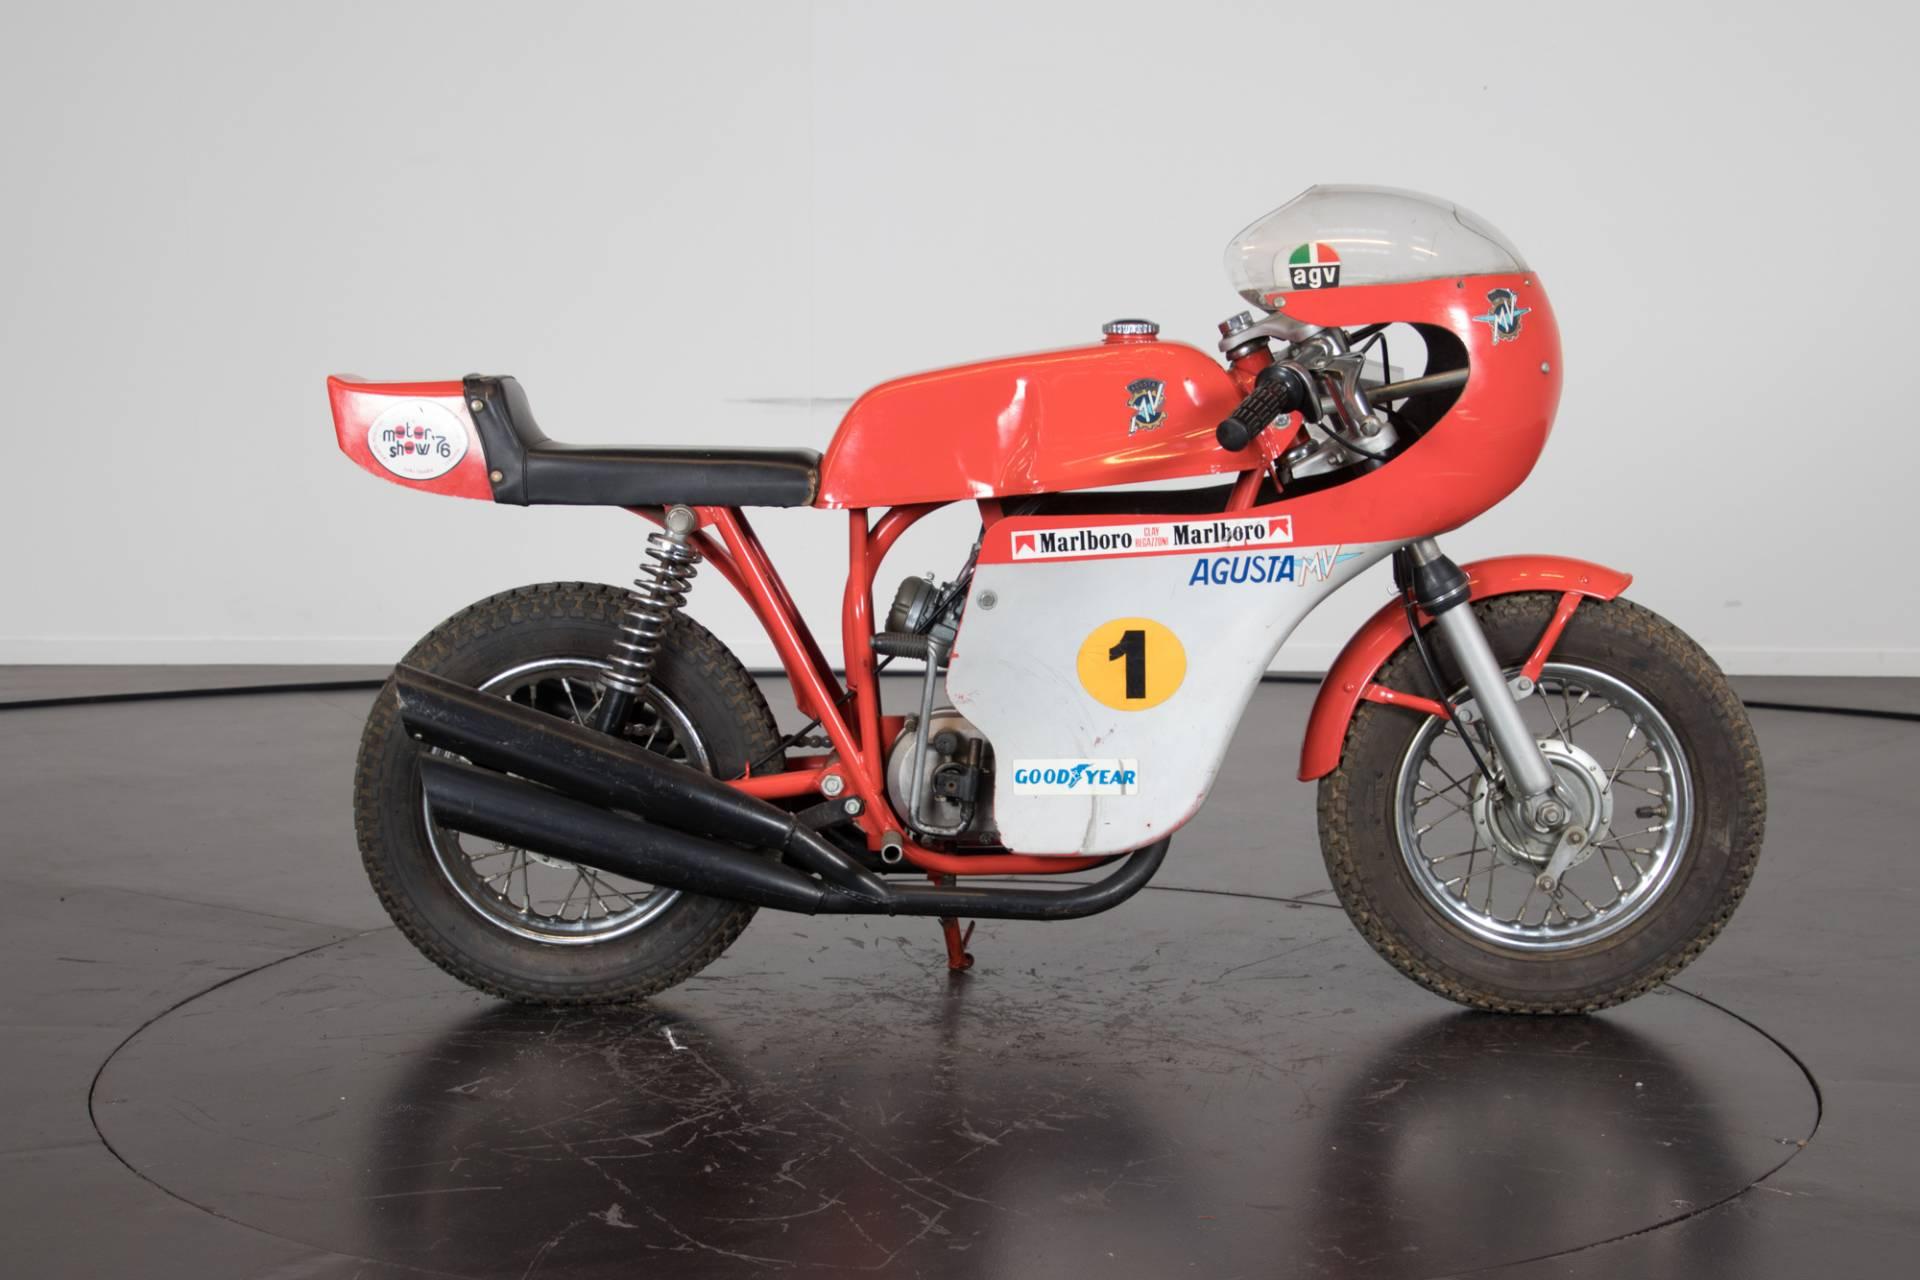 mv agusta mini bike racing 1974 f r eur kaufen. Black Bedroom Furniture Sets. Home Design Ideas